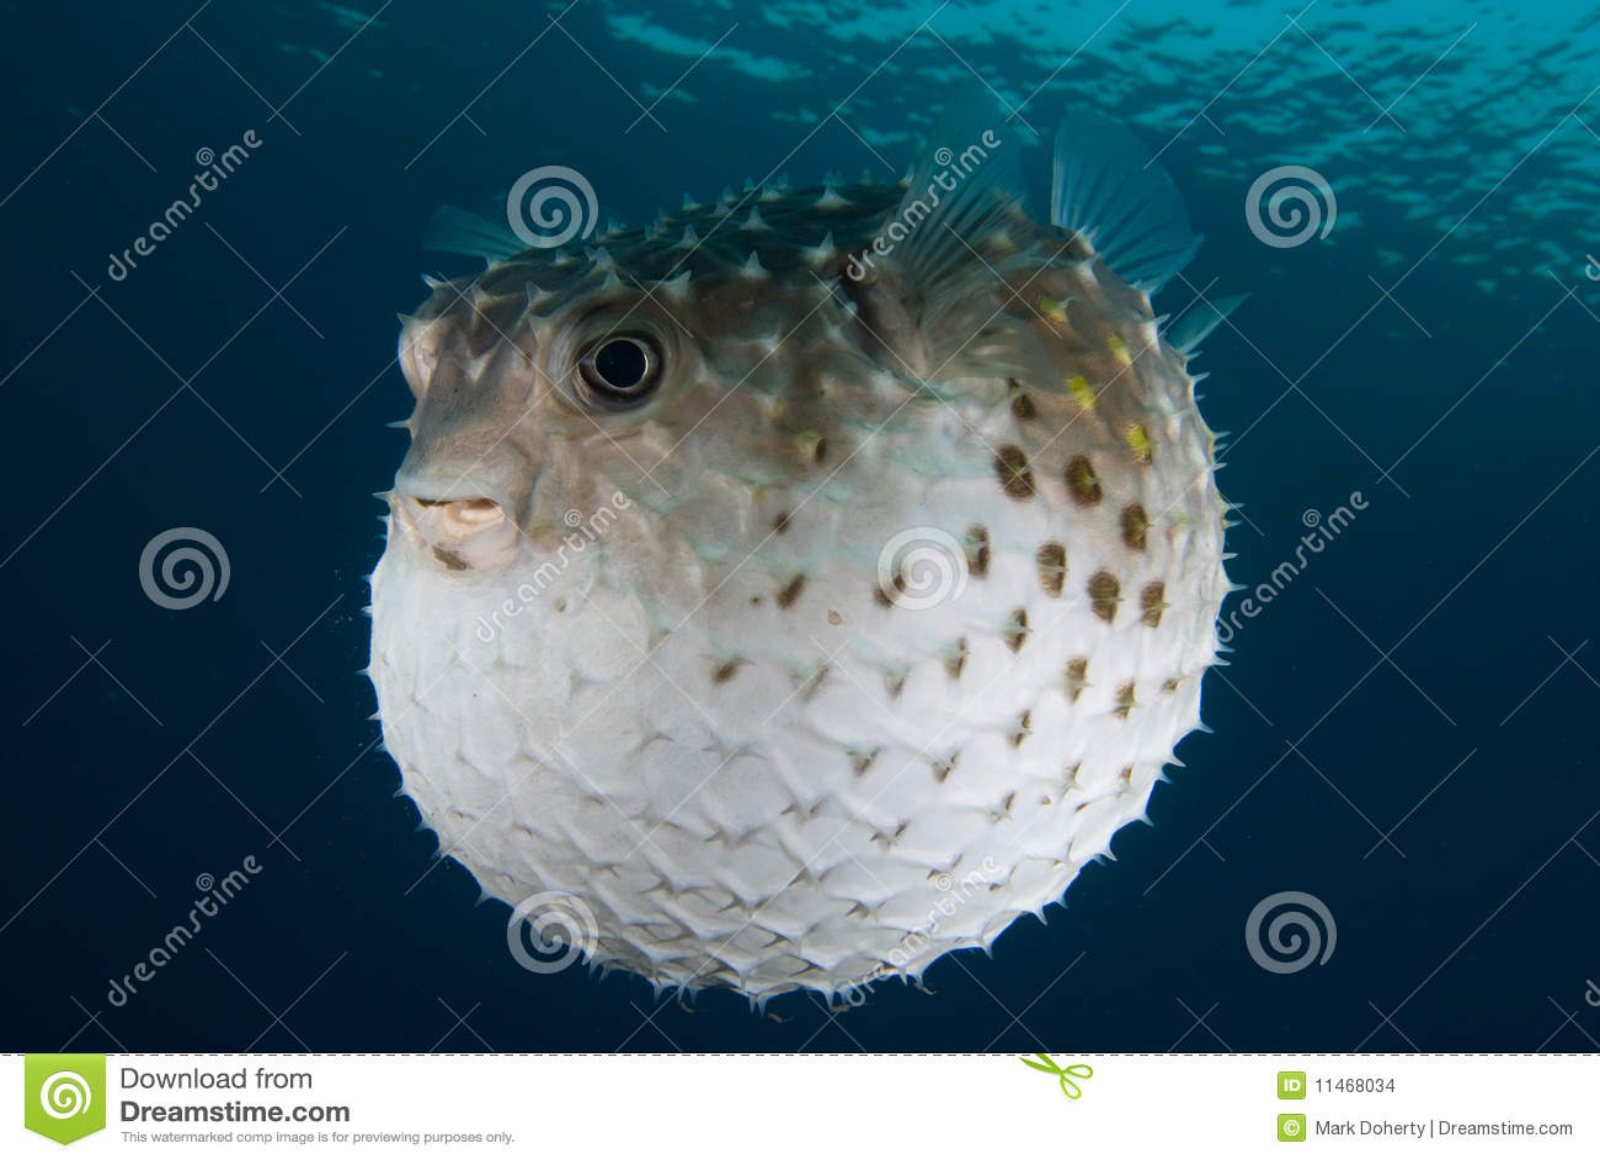 Diodonhystrixporcupinefishen pusta upp